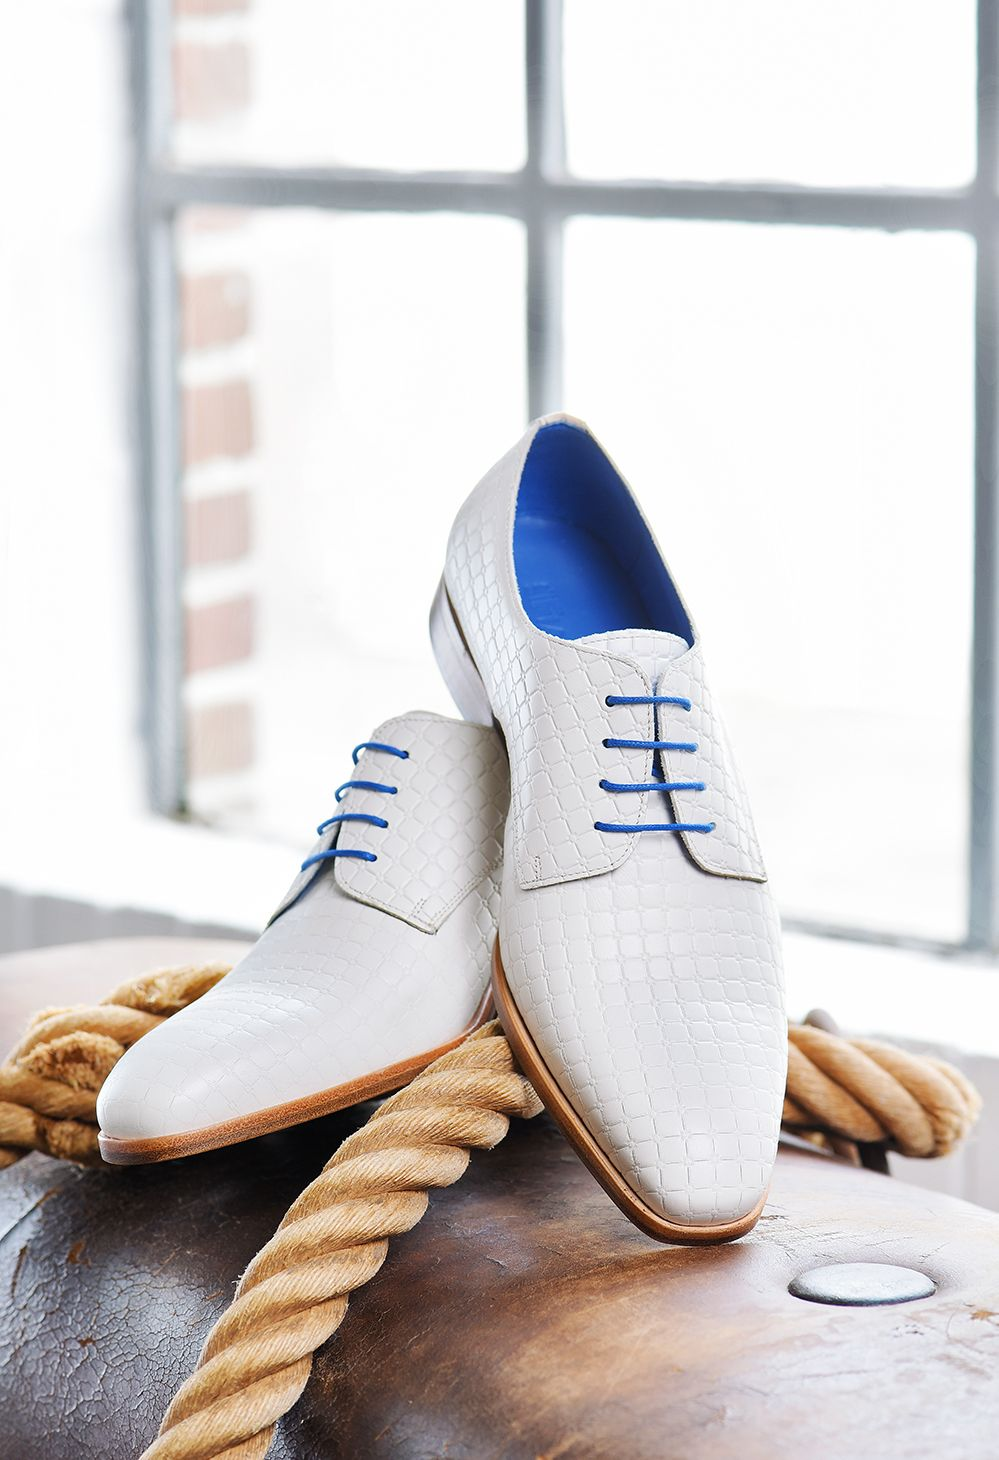 Groom #ivory #Calfleather #Classicshoes #fashionshoes